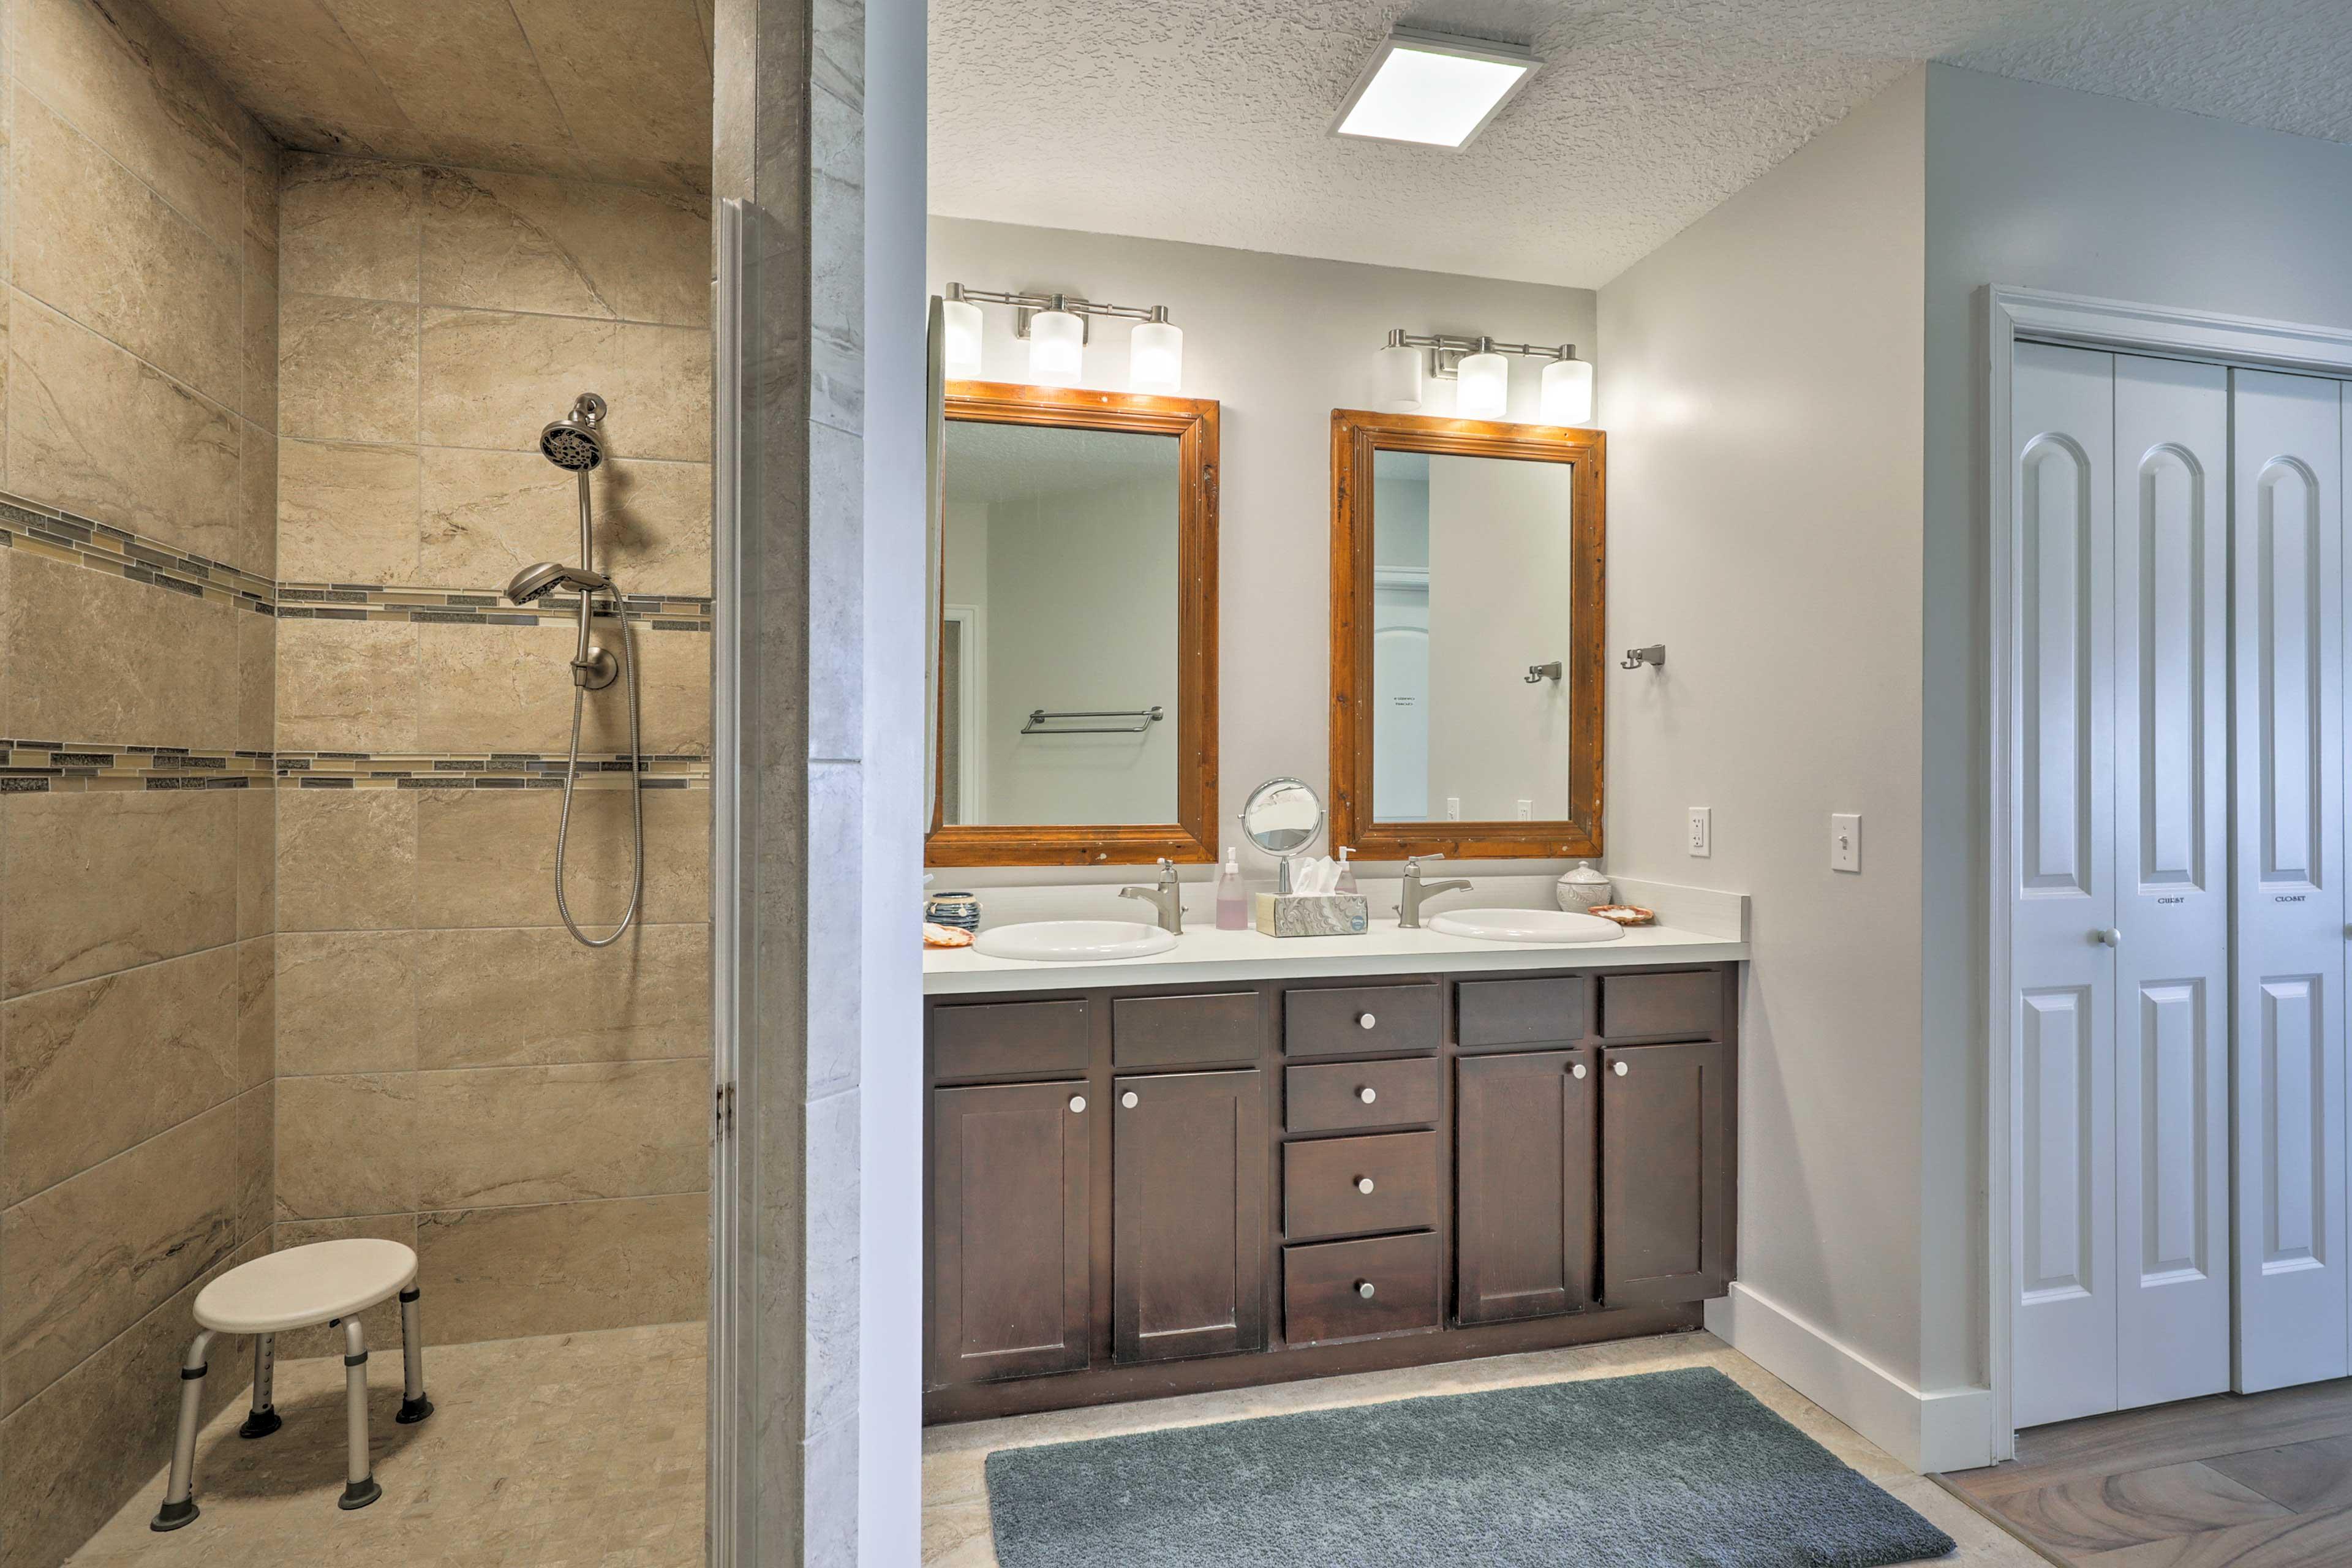 Both masters offer en-suite baths.